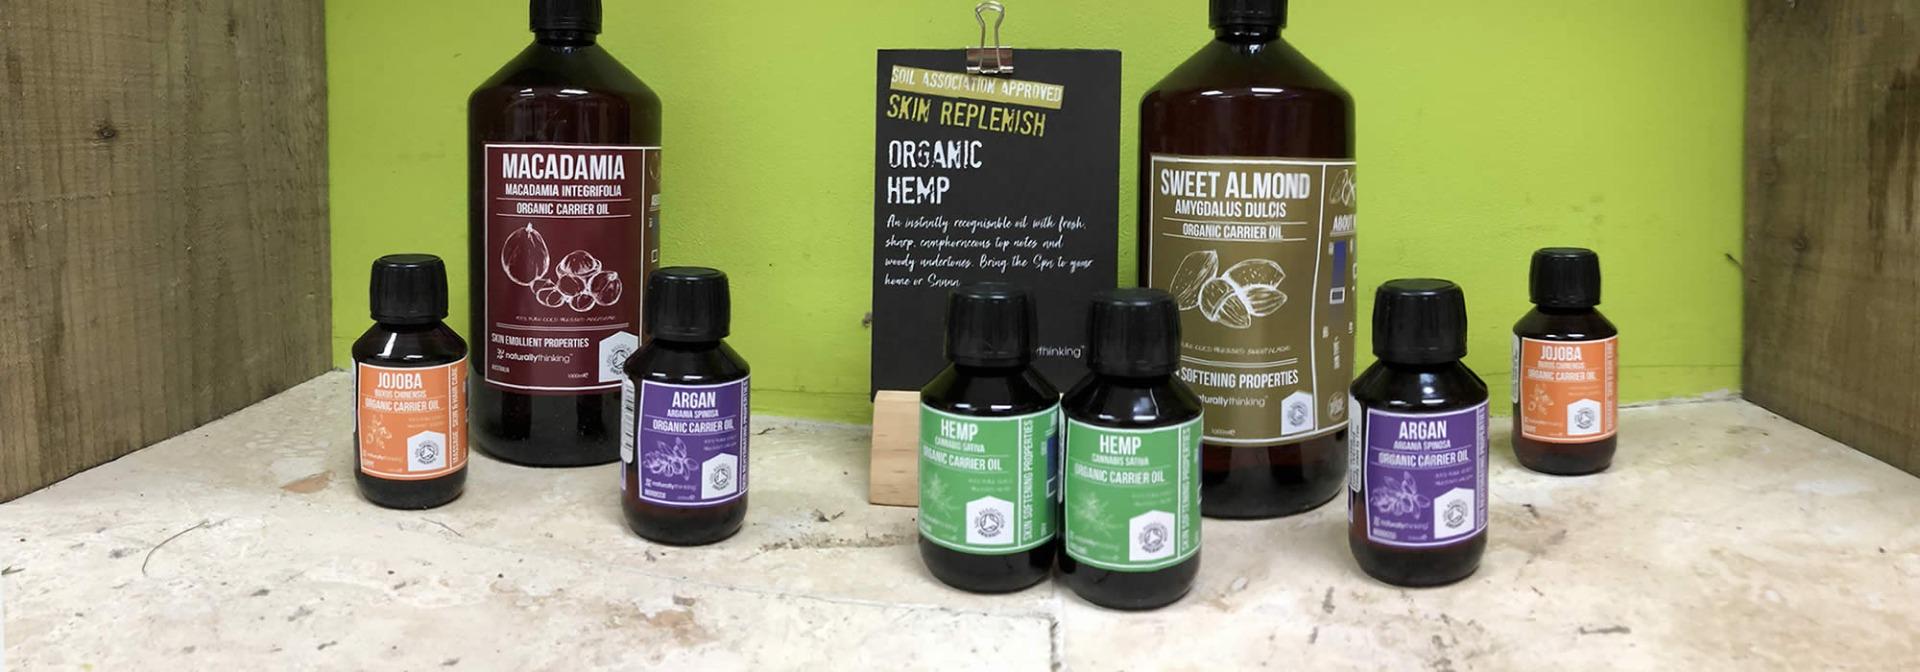 organic-carrier-oils-header.jpg